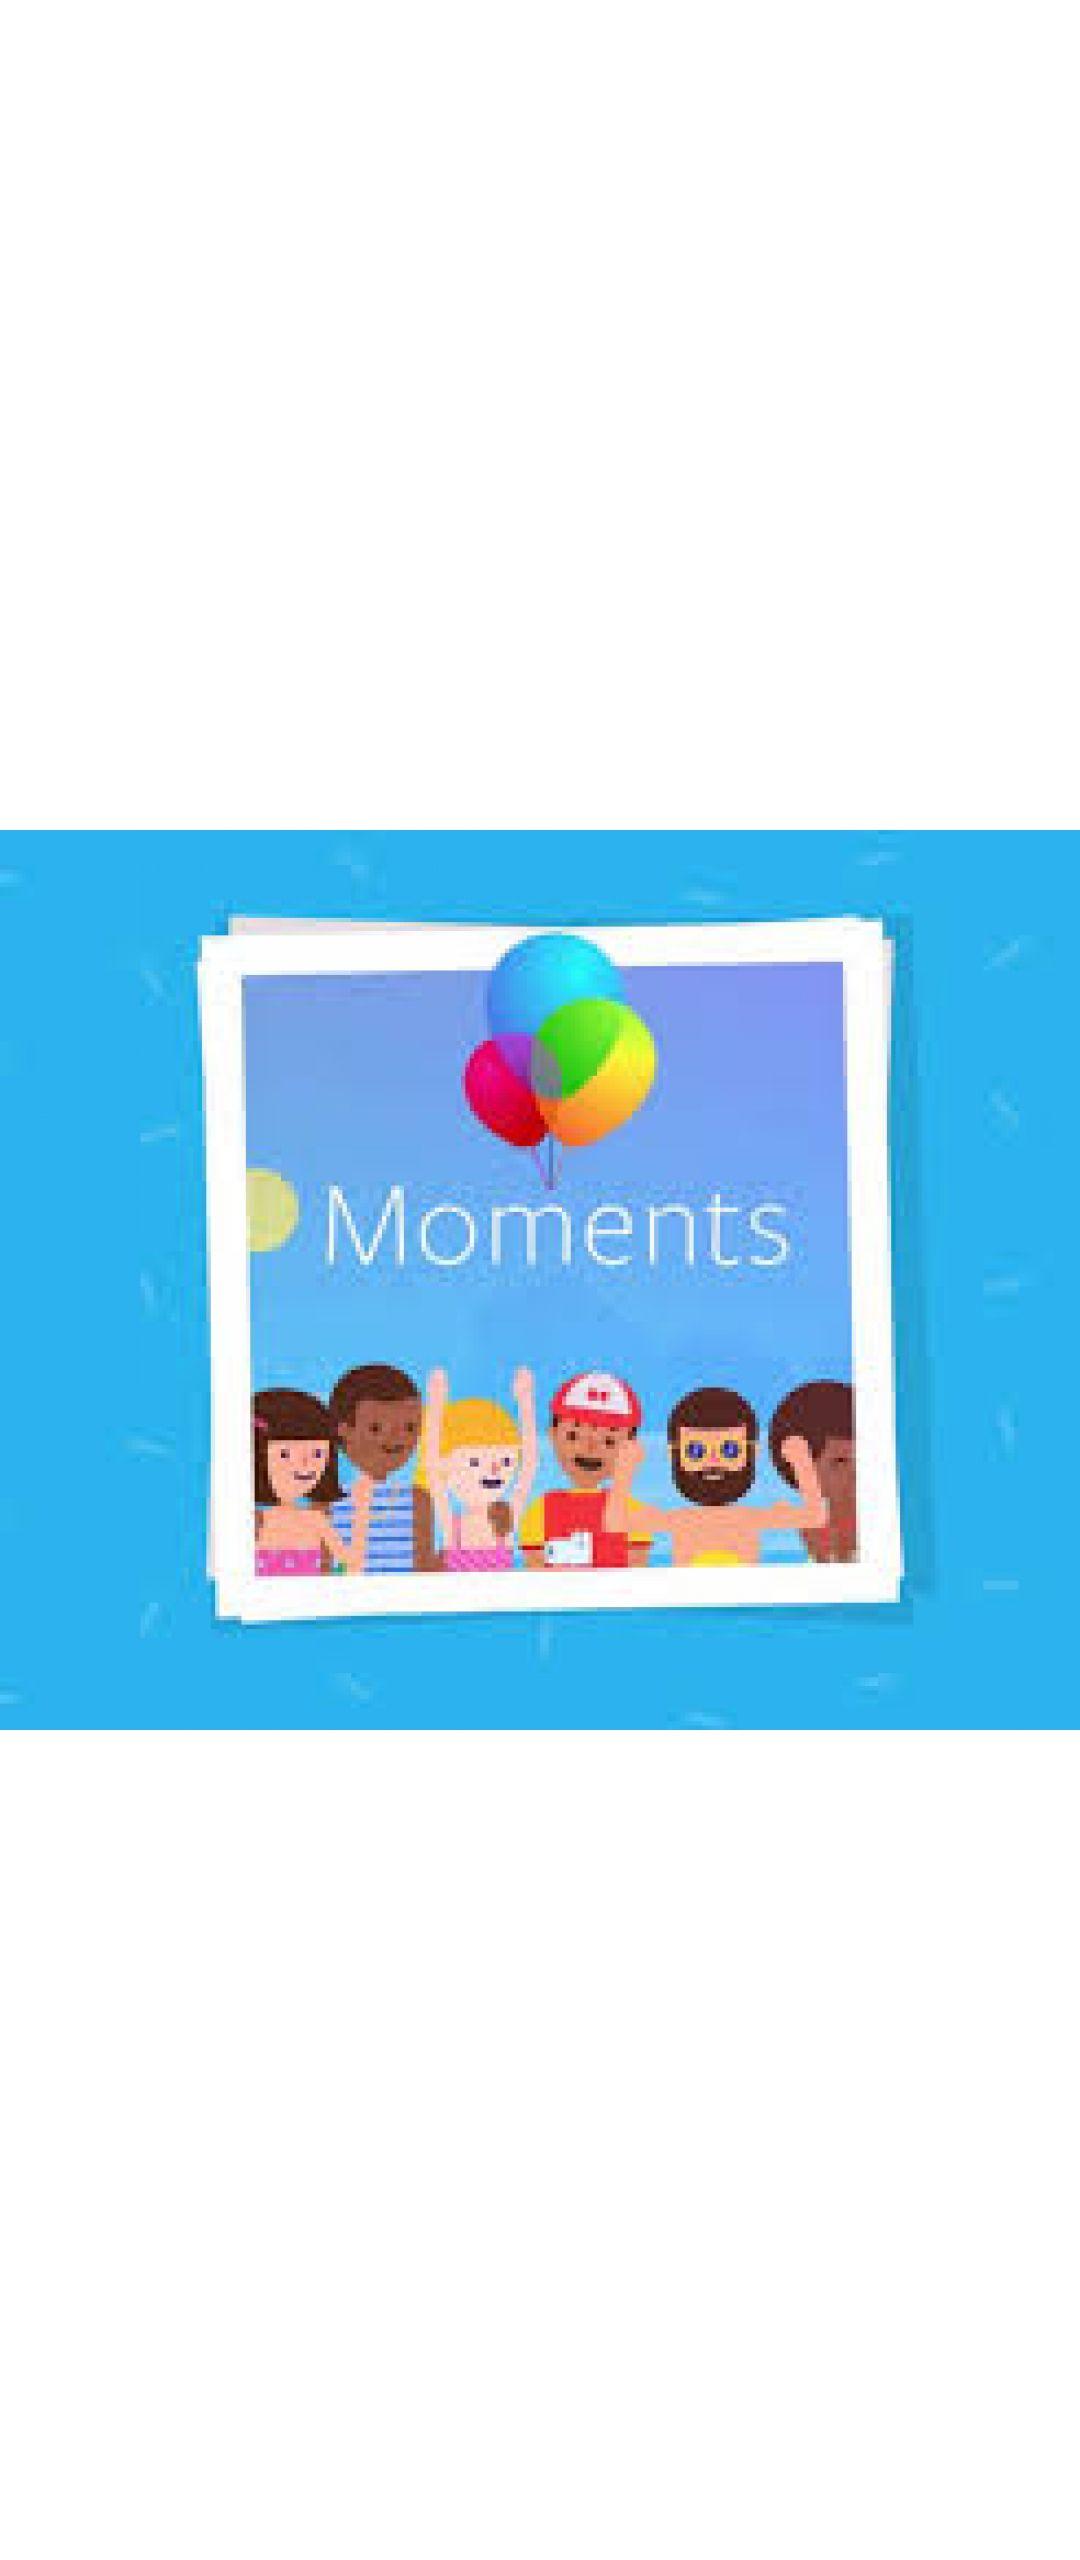 Facebook borrar� tus fotos para obligarte a instalar �Moments�